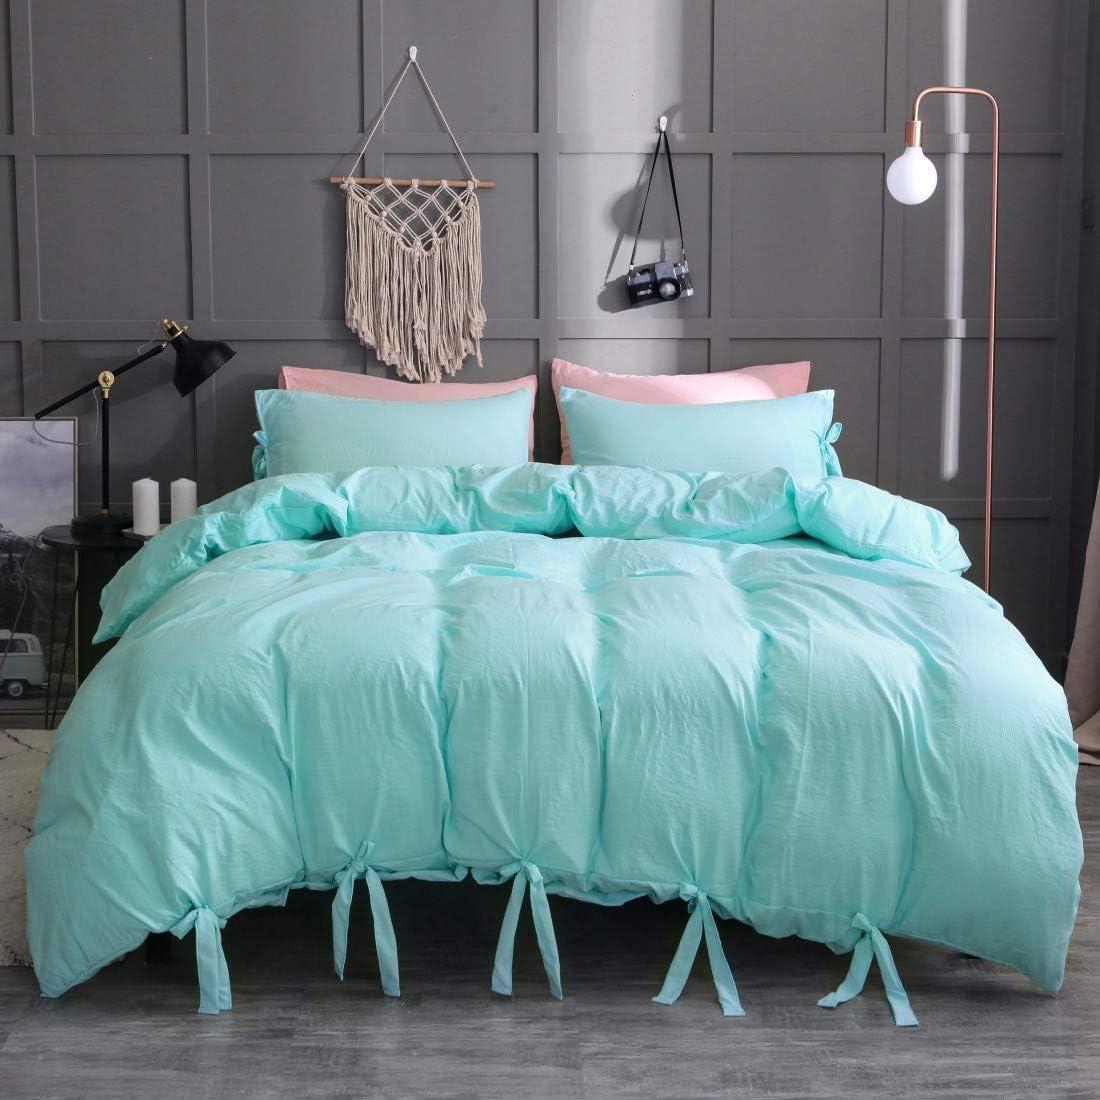 Rapid rise Miss Cora Duvet Cover Manufacturer direct delivery Sets 3 Pieces Cotton Washed Closure Strap